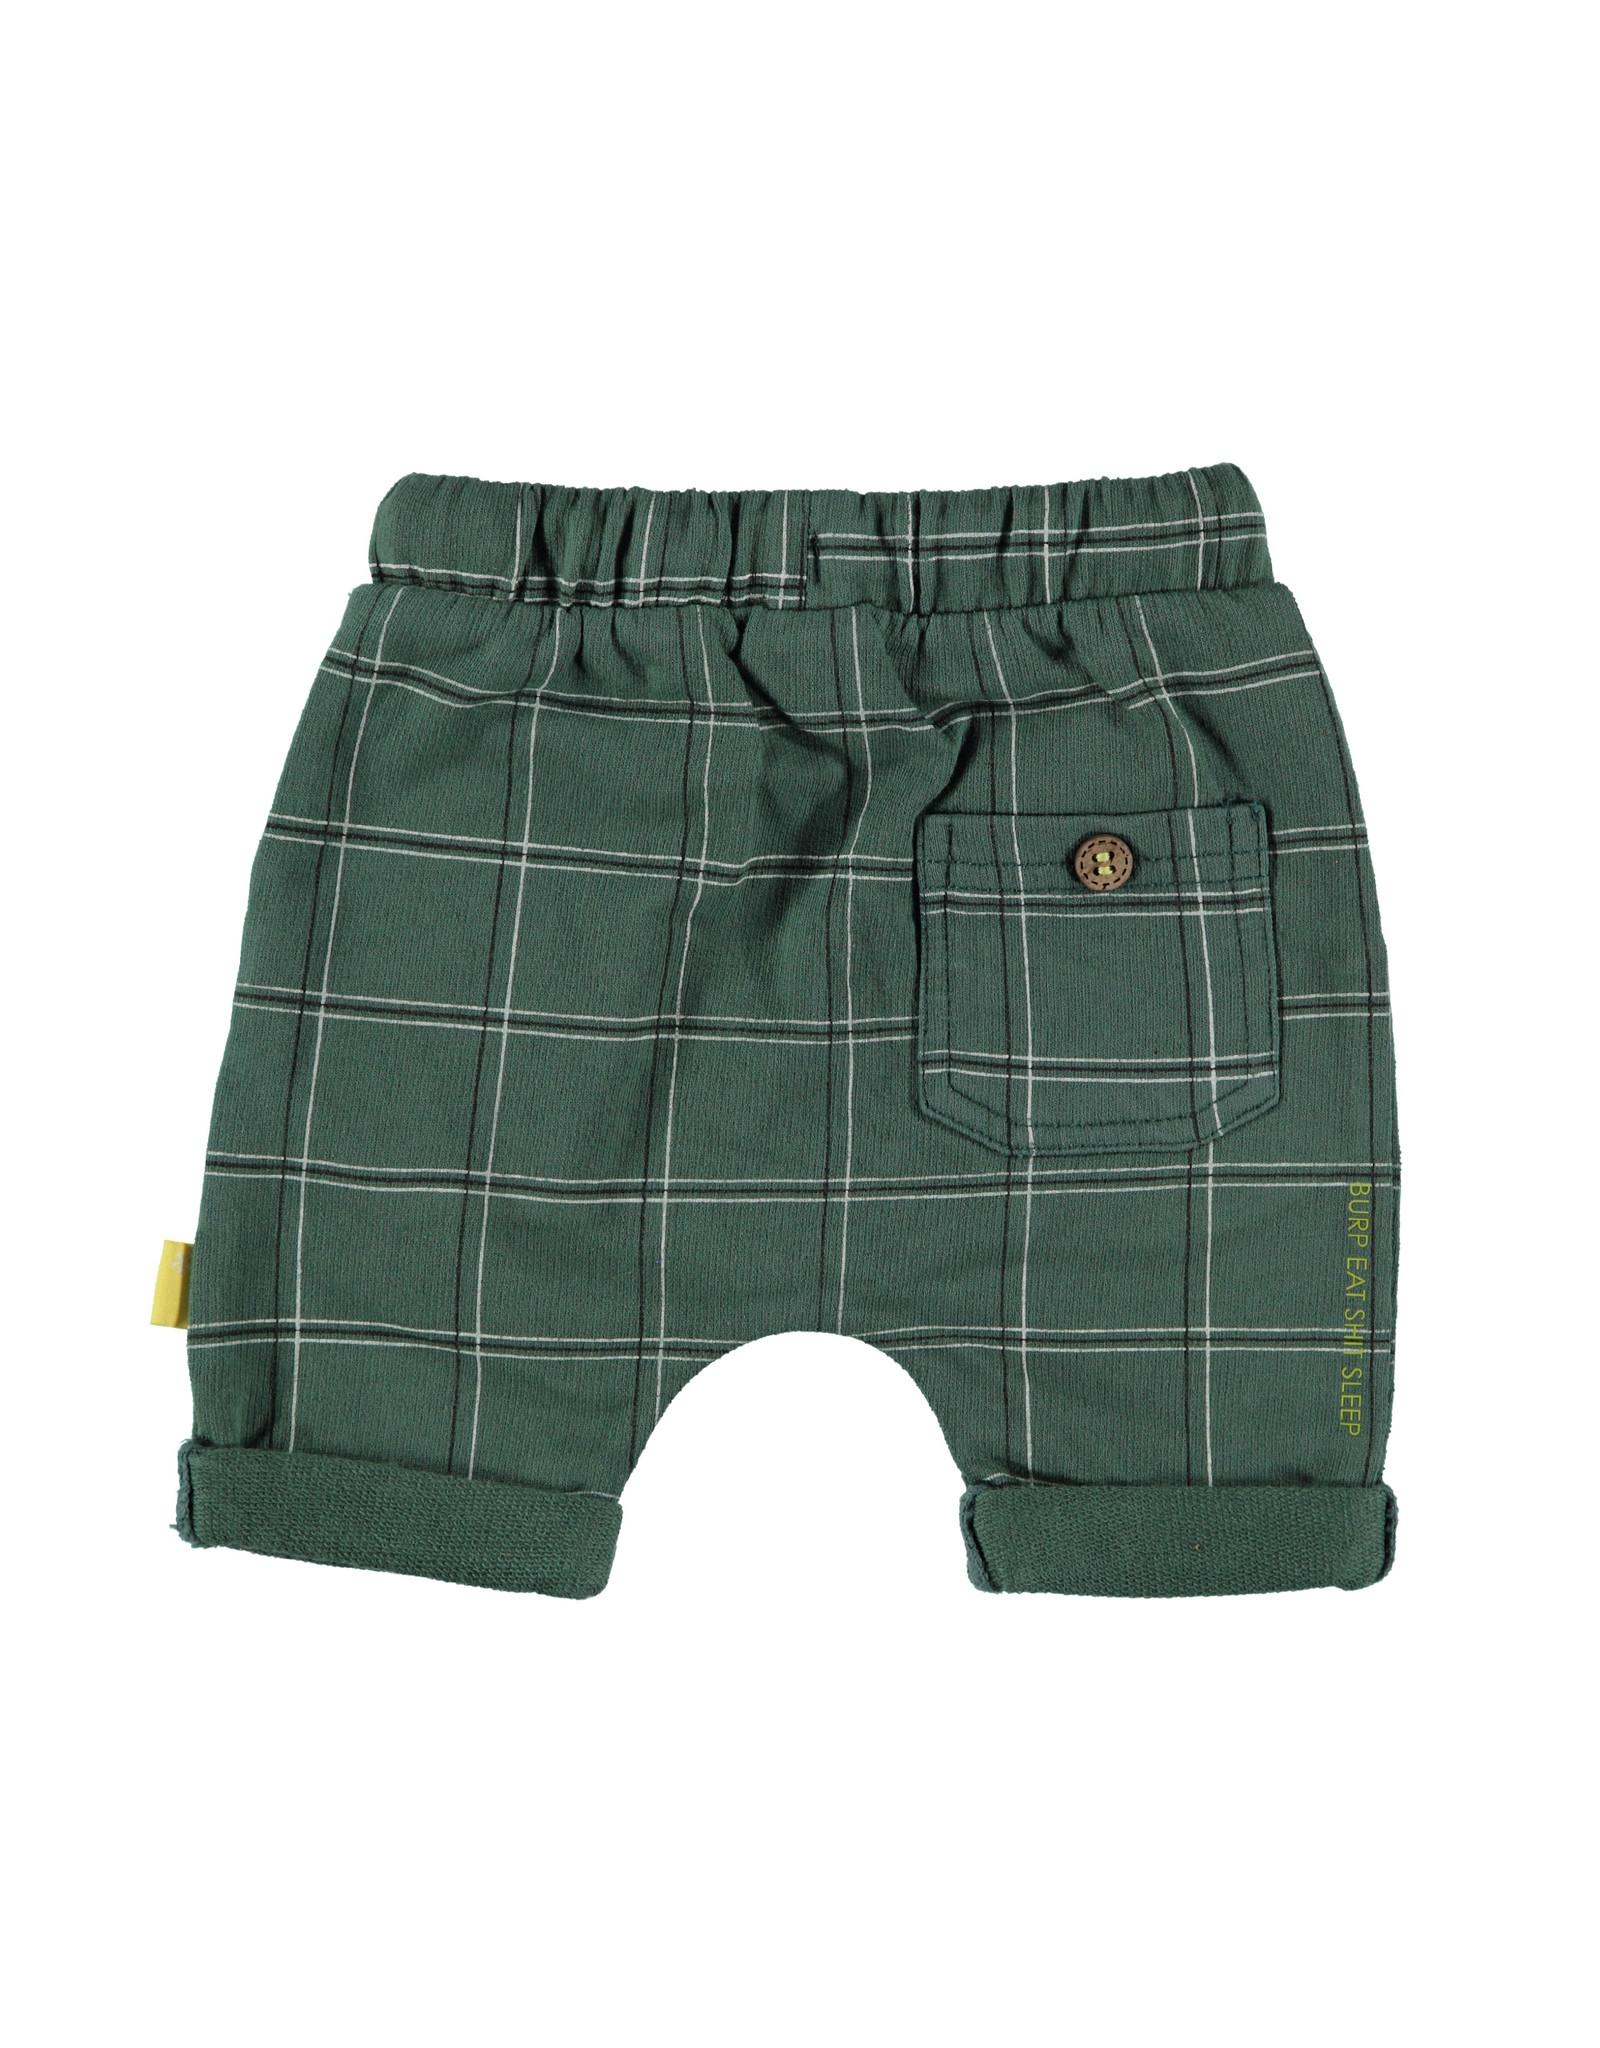 B.E.S.S. Shorts Check, Green